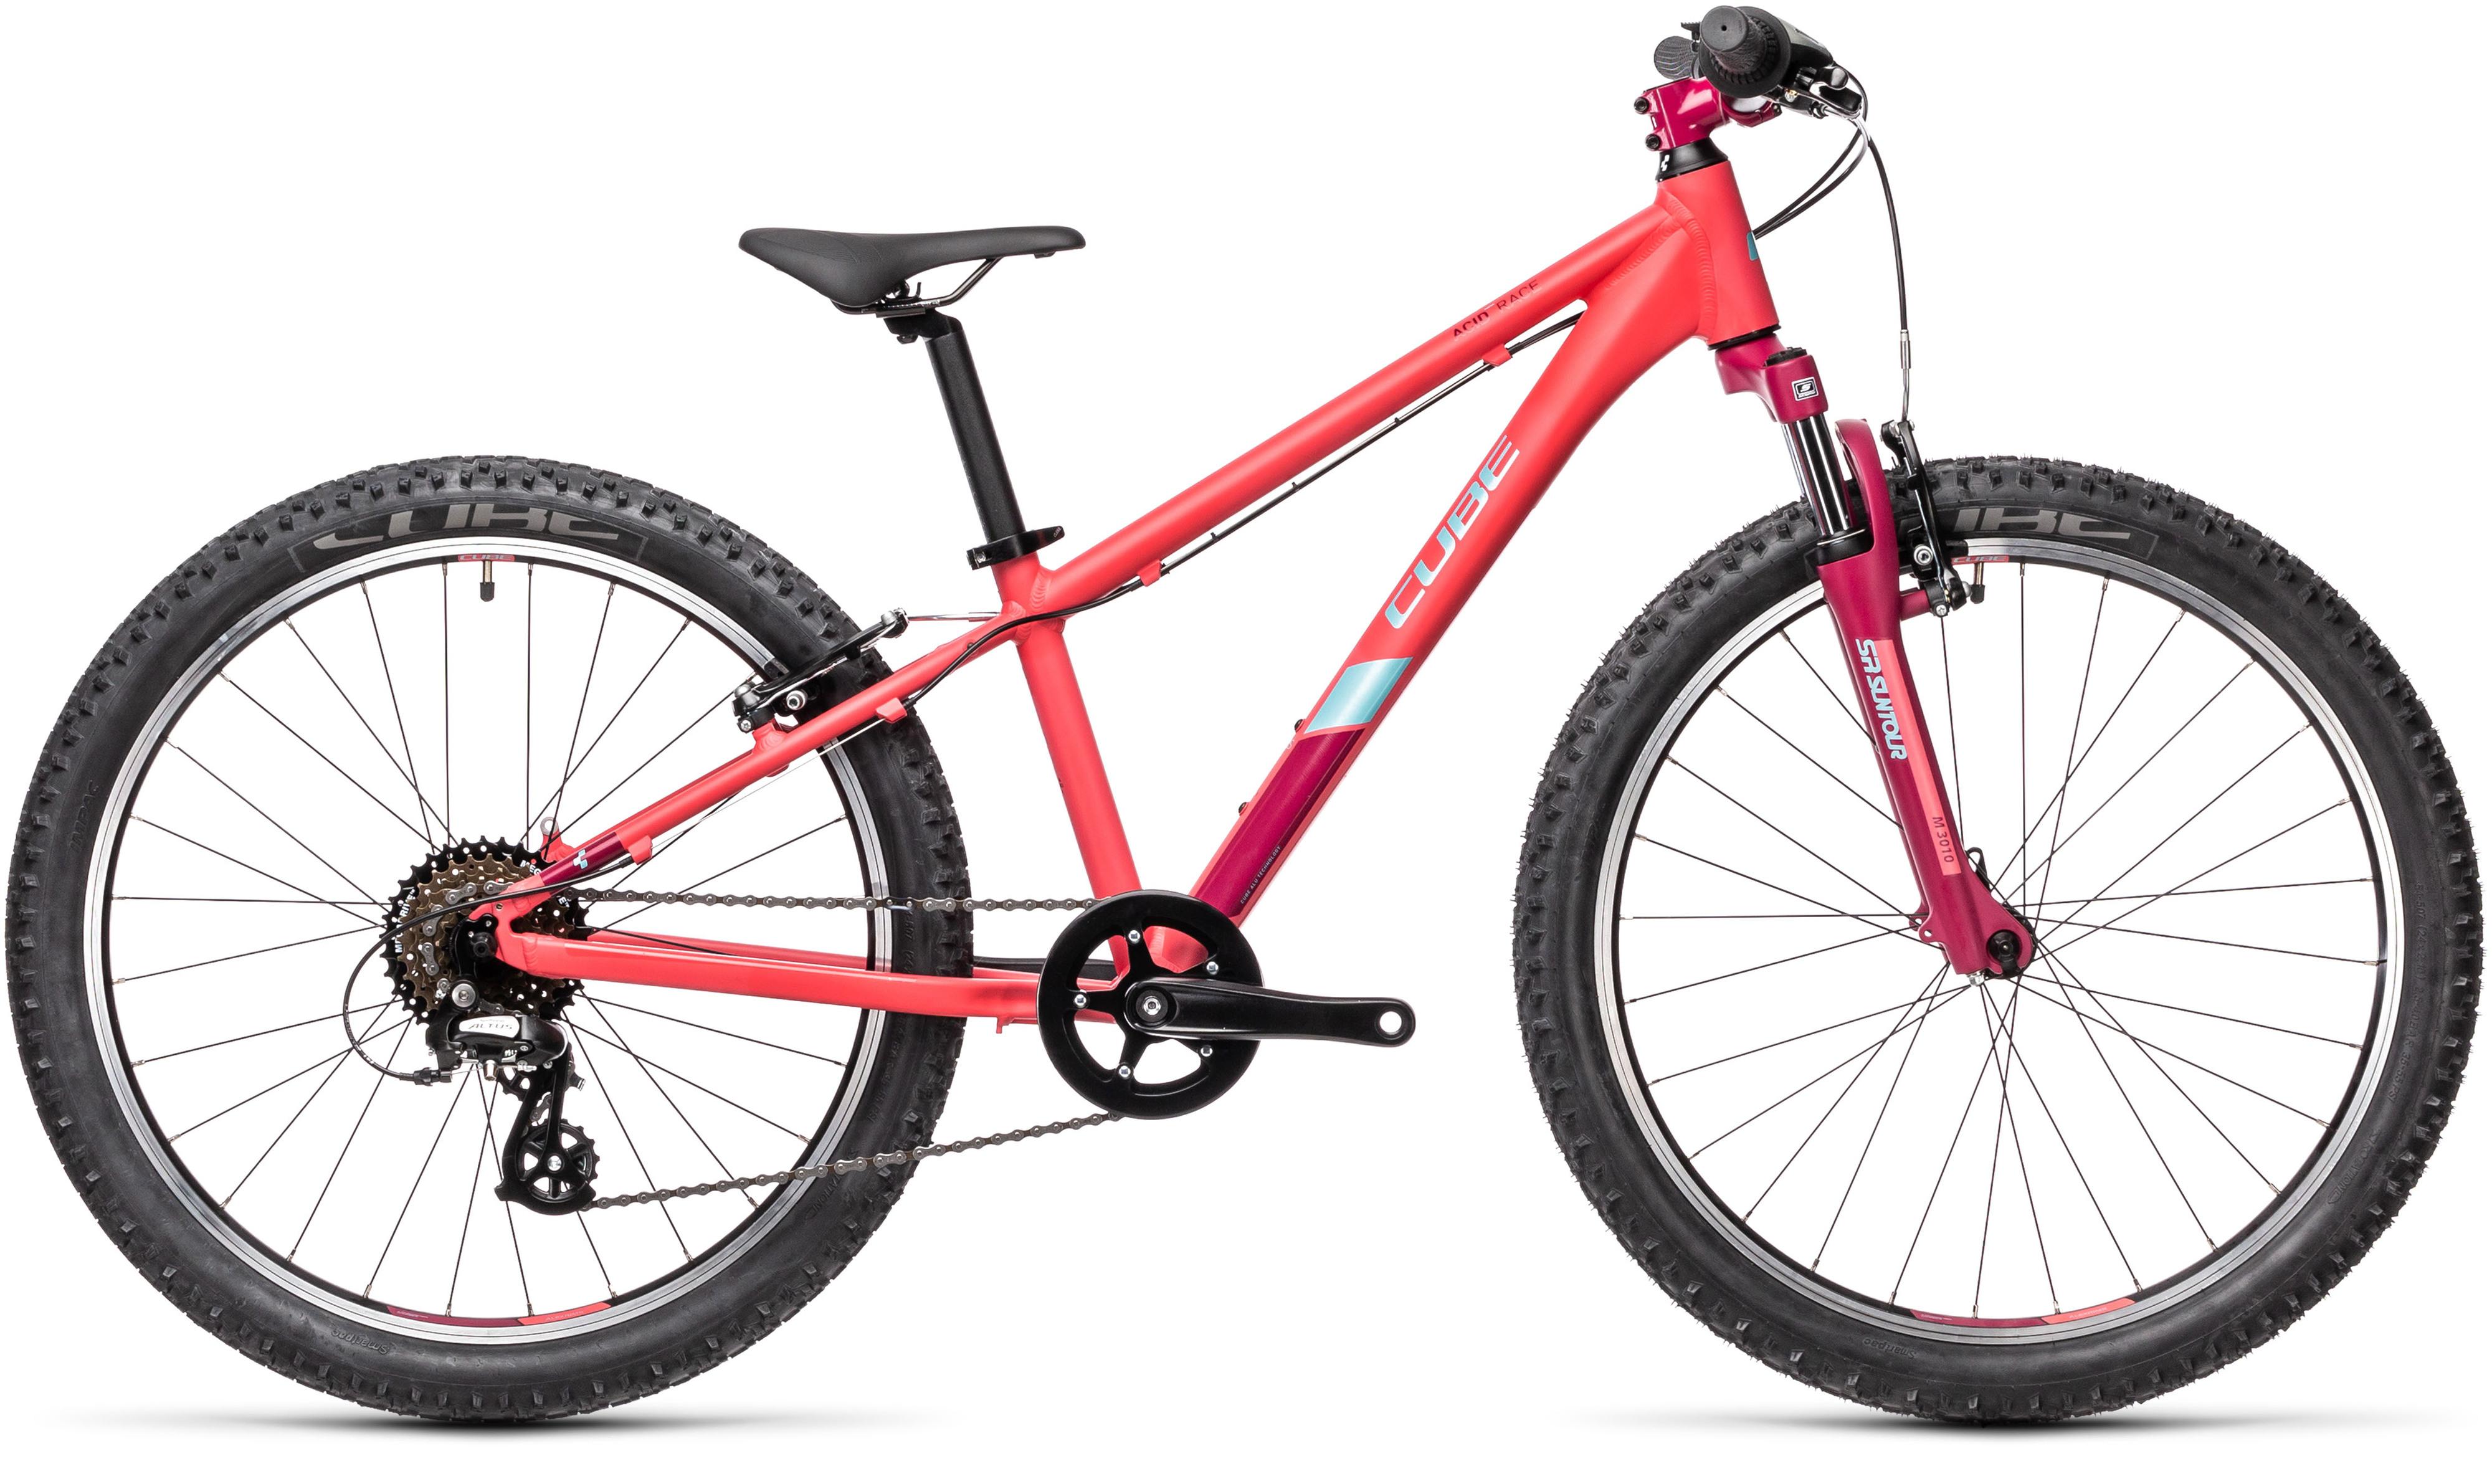 Cube Acid 240 24in Wheel Kids Bike 2021 Coral